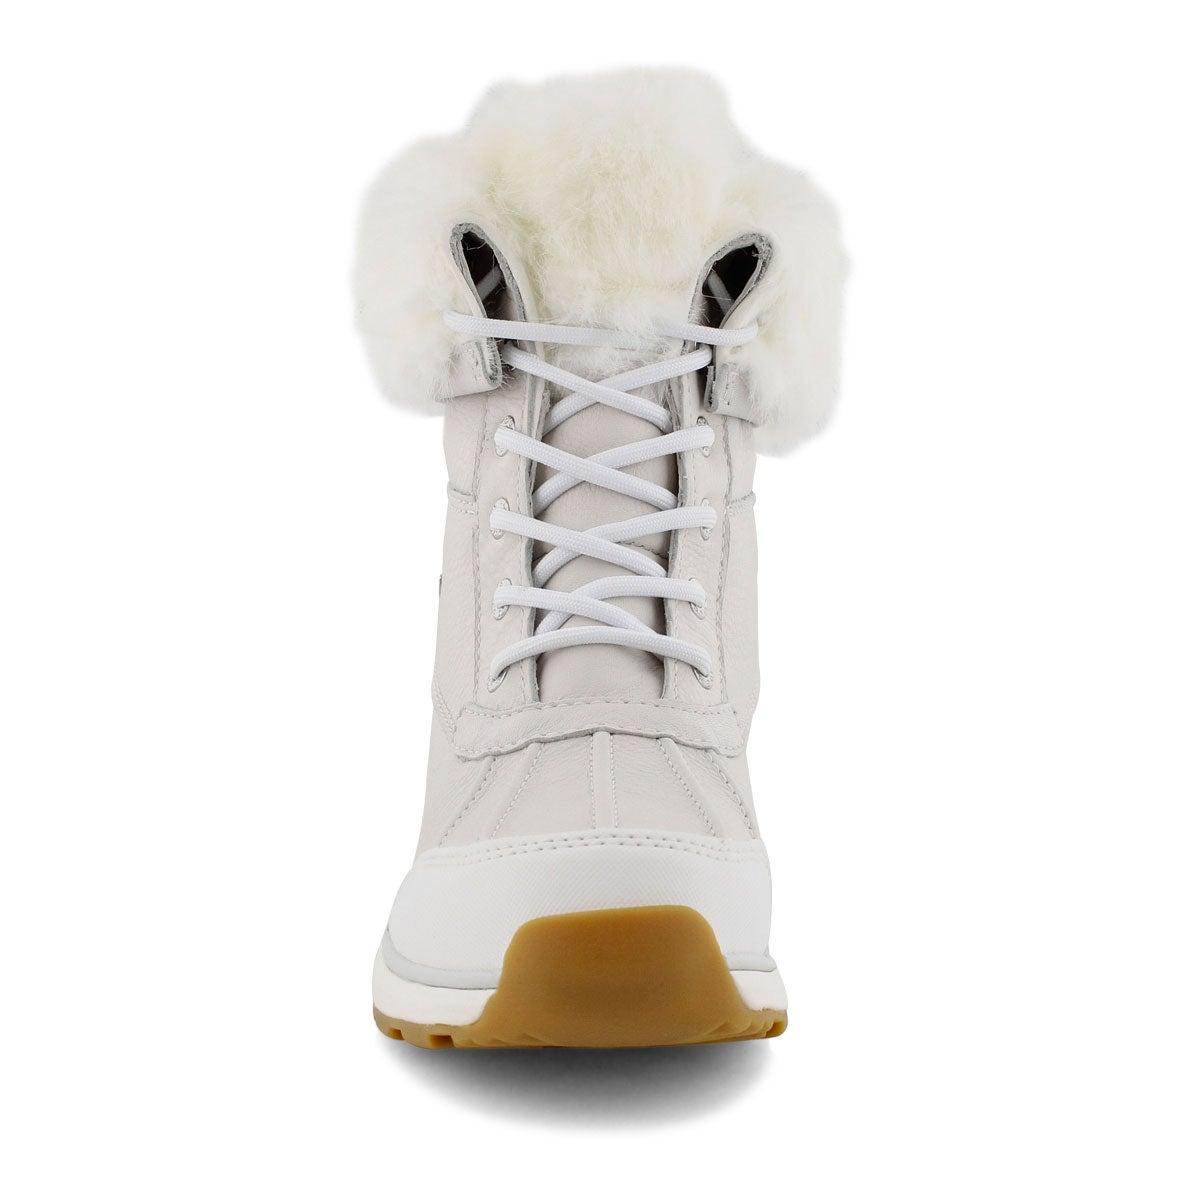 Lds Adirondack III Fluff wht winter boot